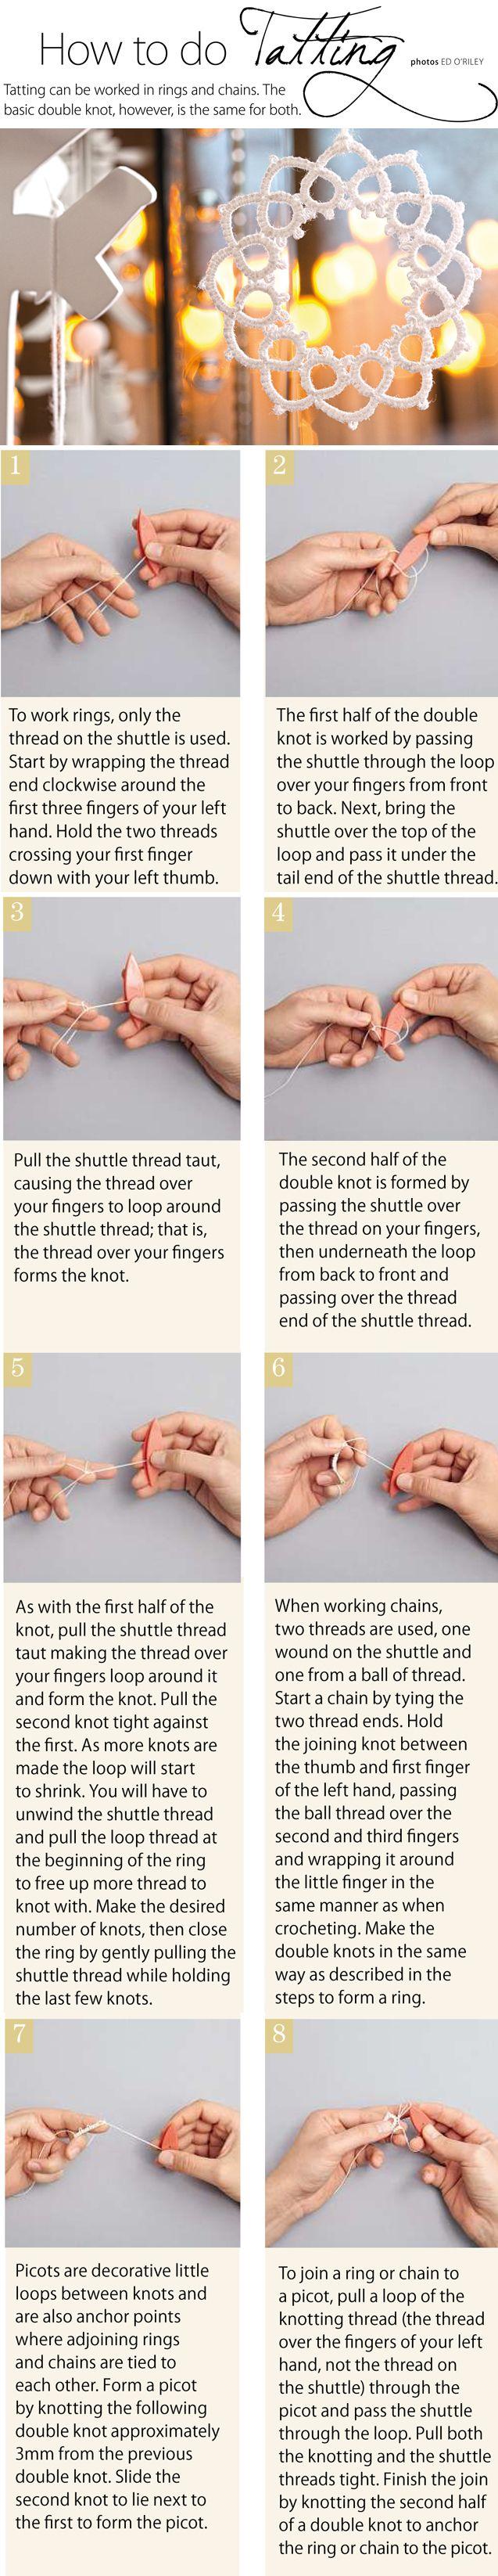 How to do tatting